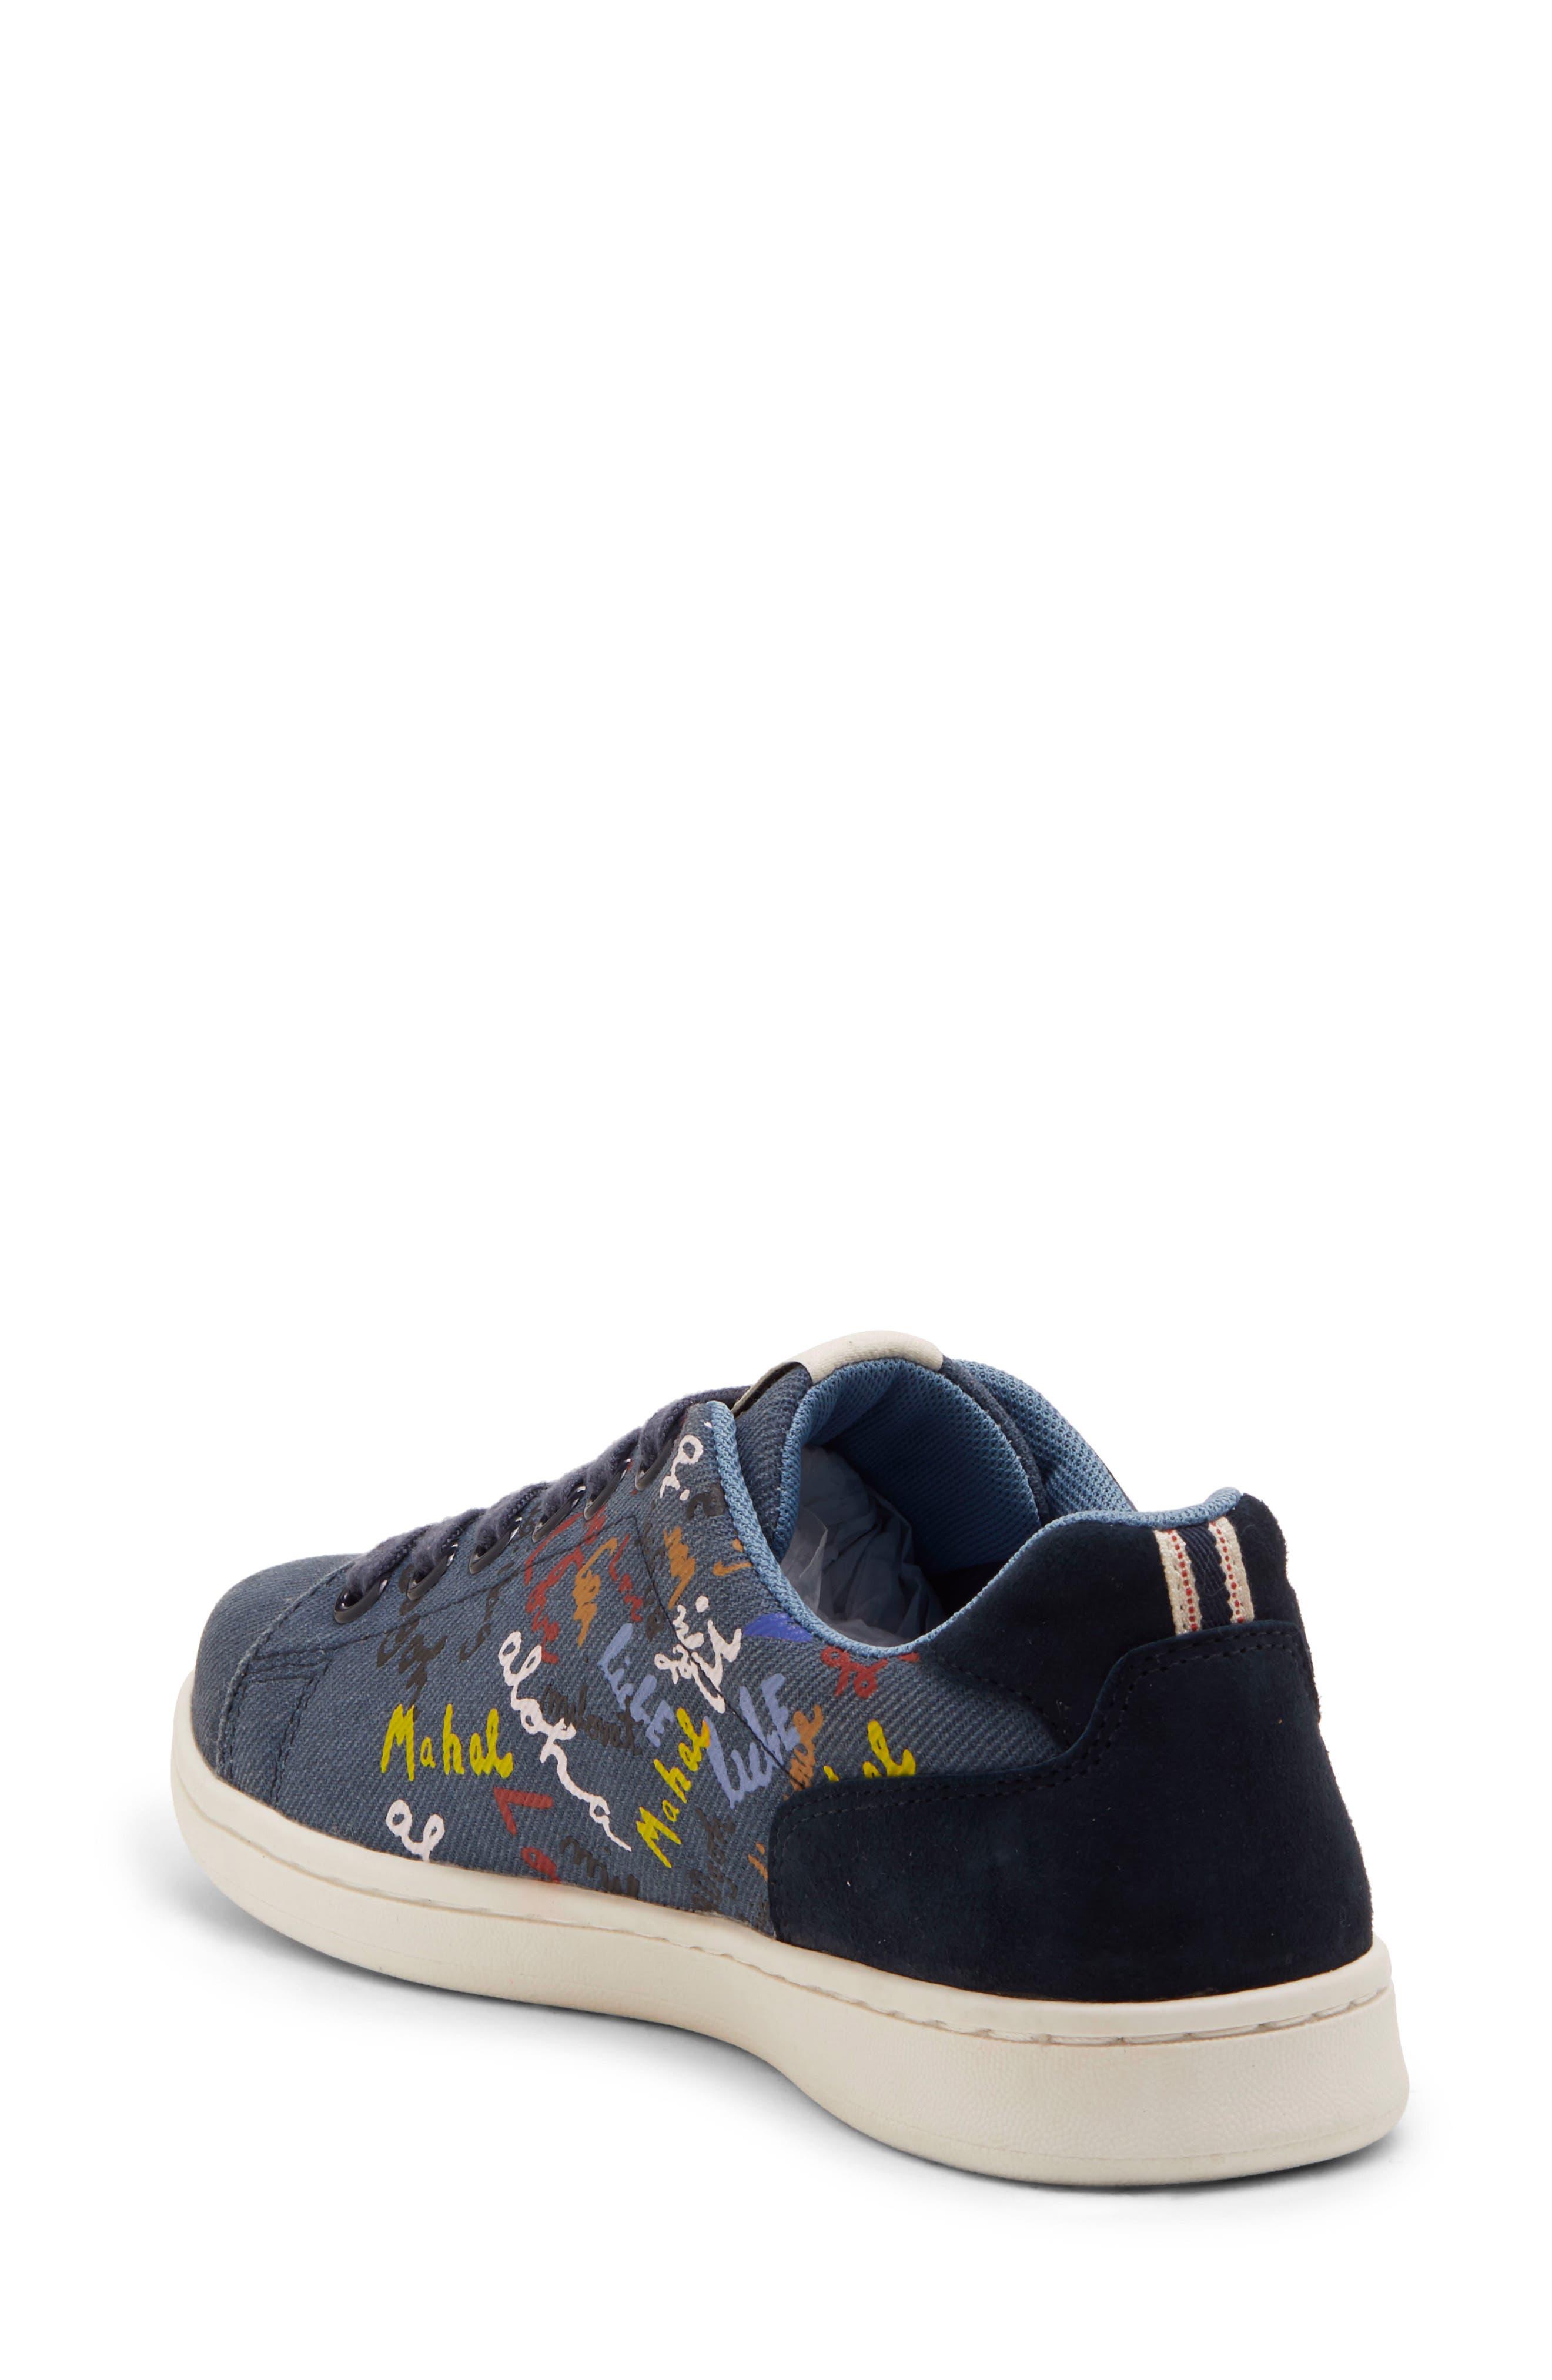 ffb2c7a07313 Women s ED Ellen Degeneres Shoes